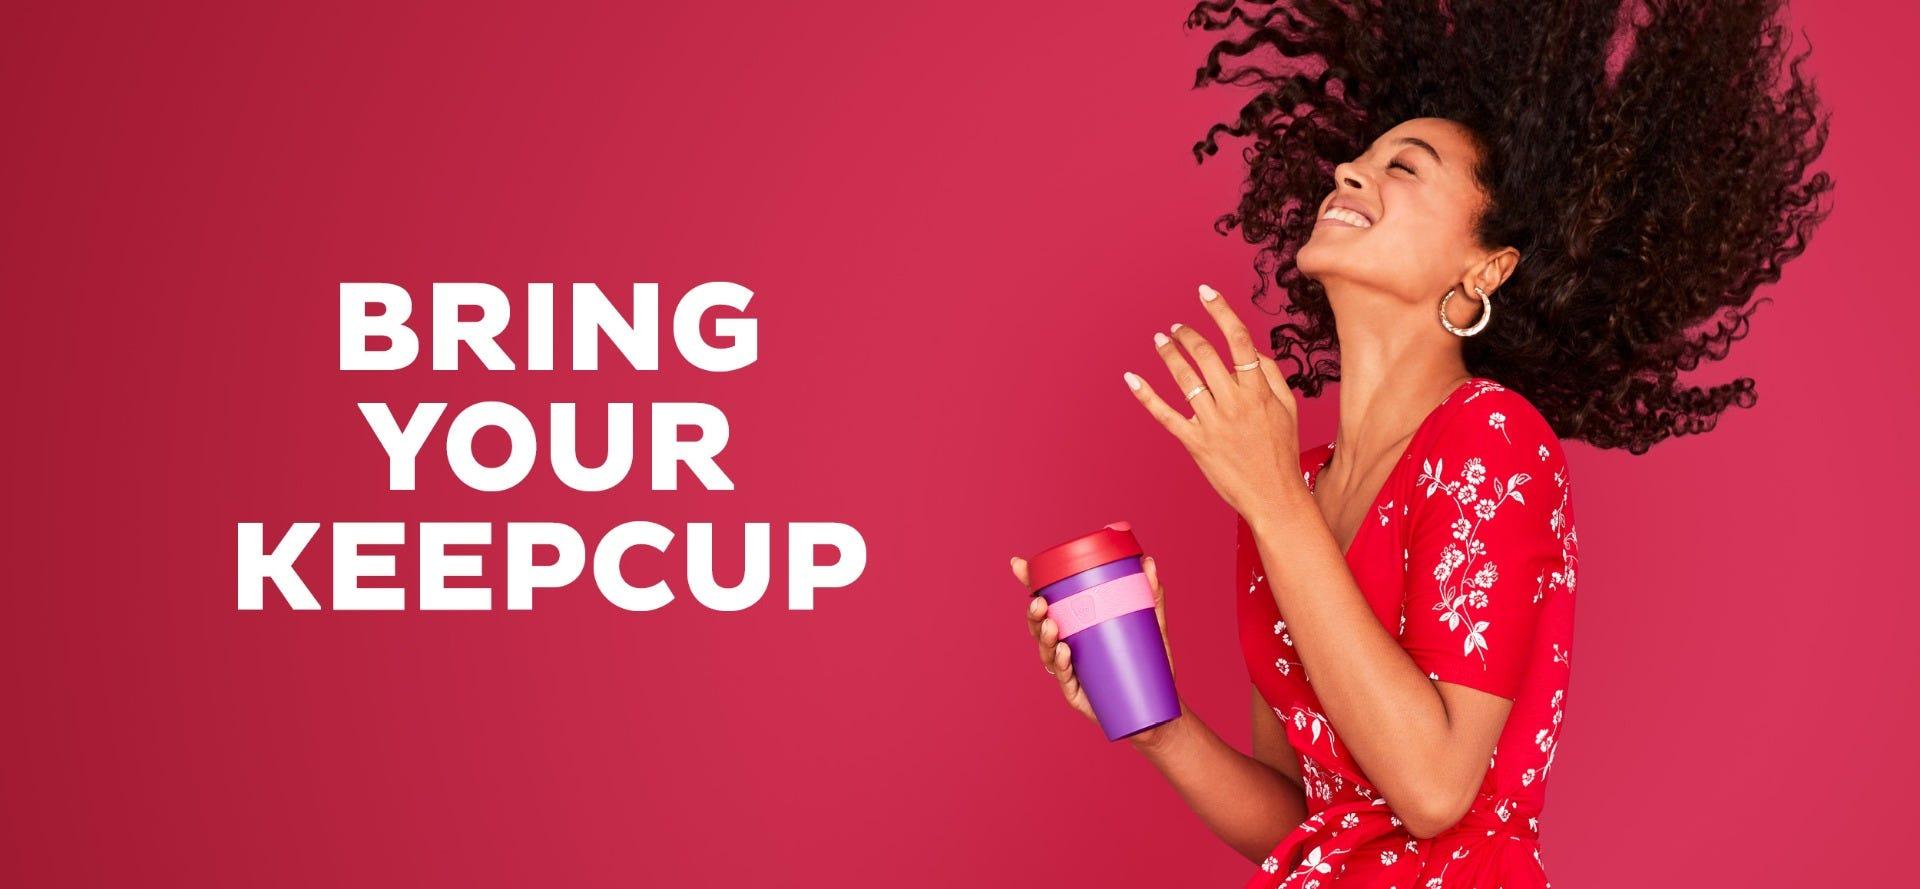 keepcup-bring-your-cup